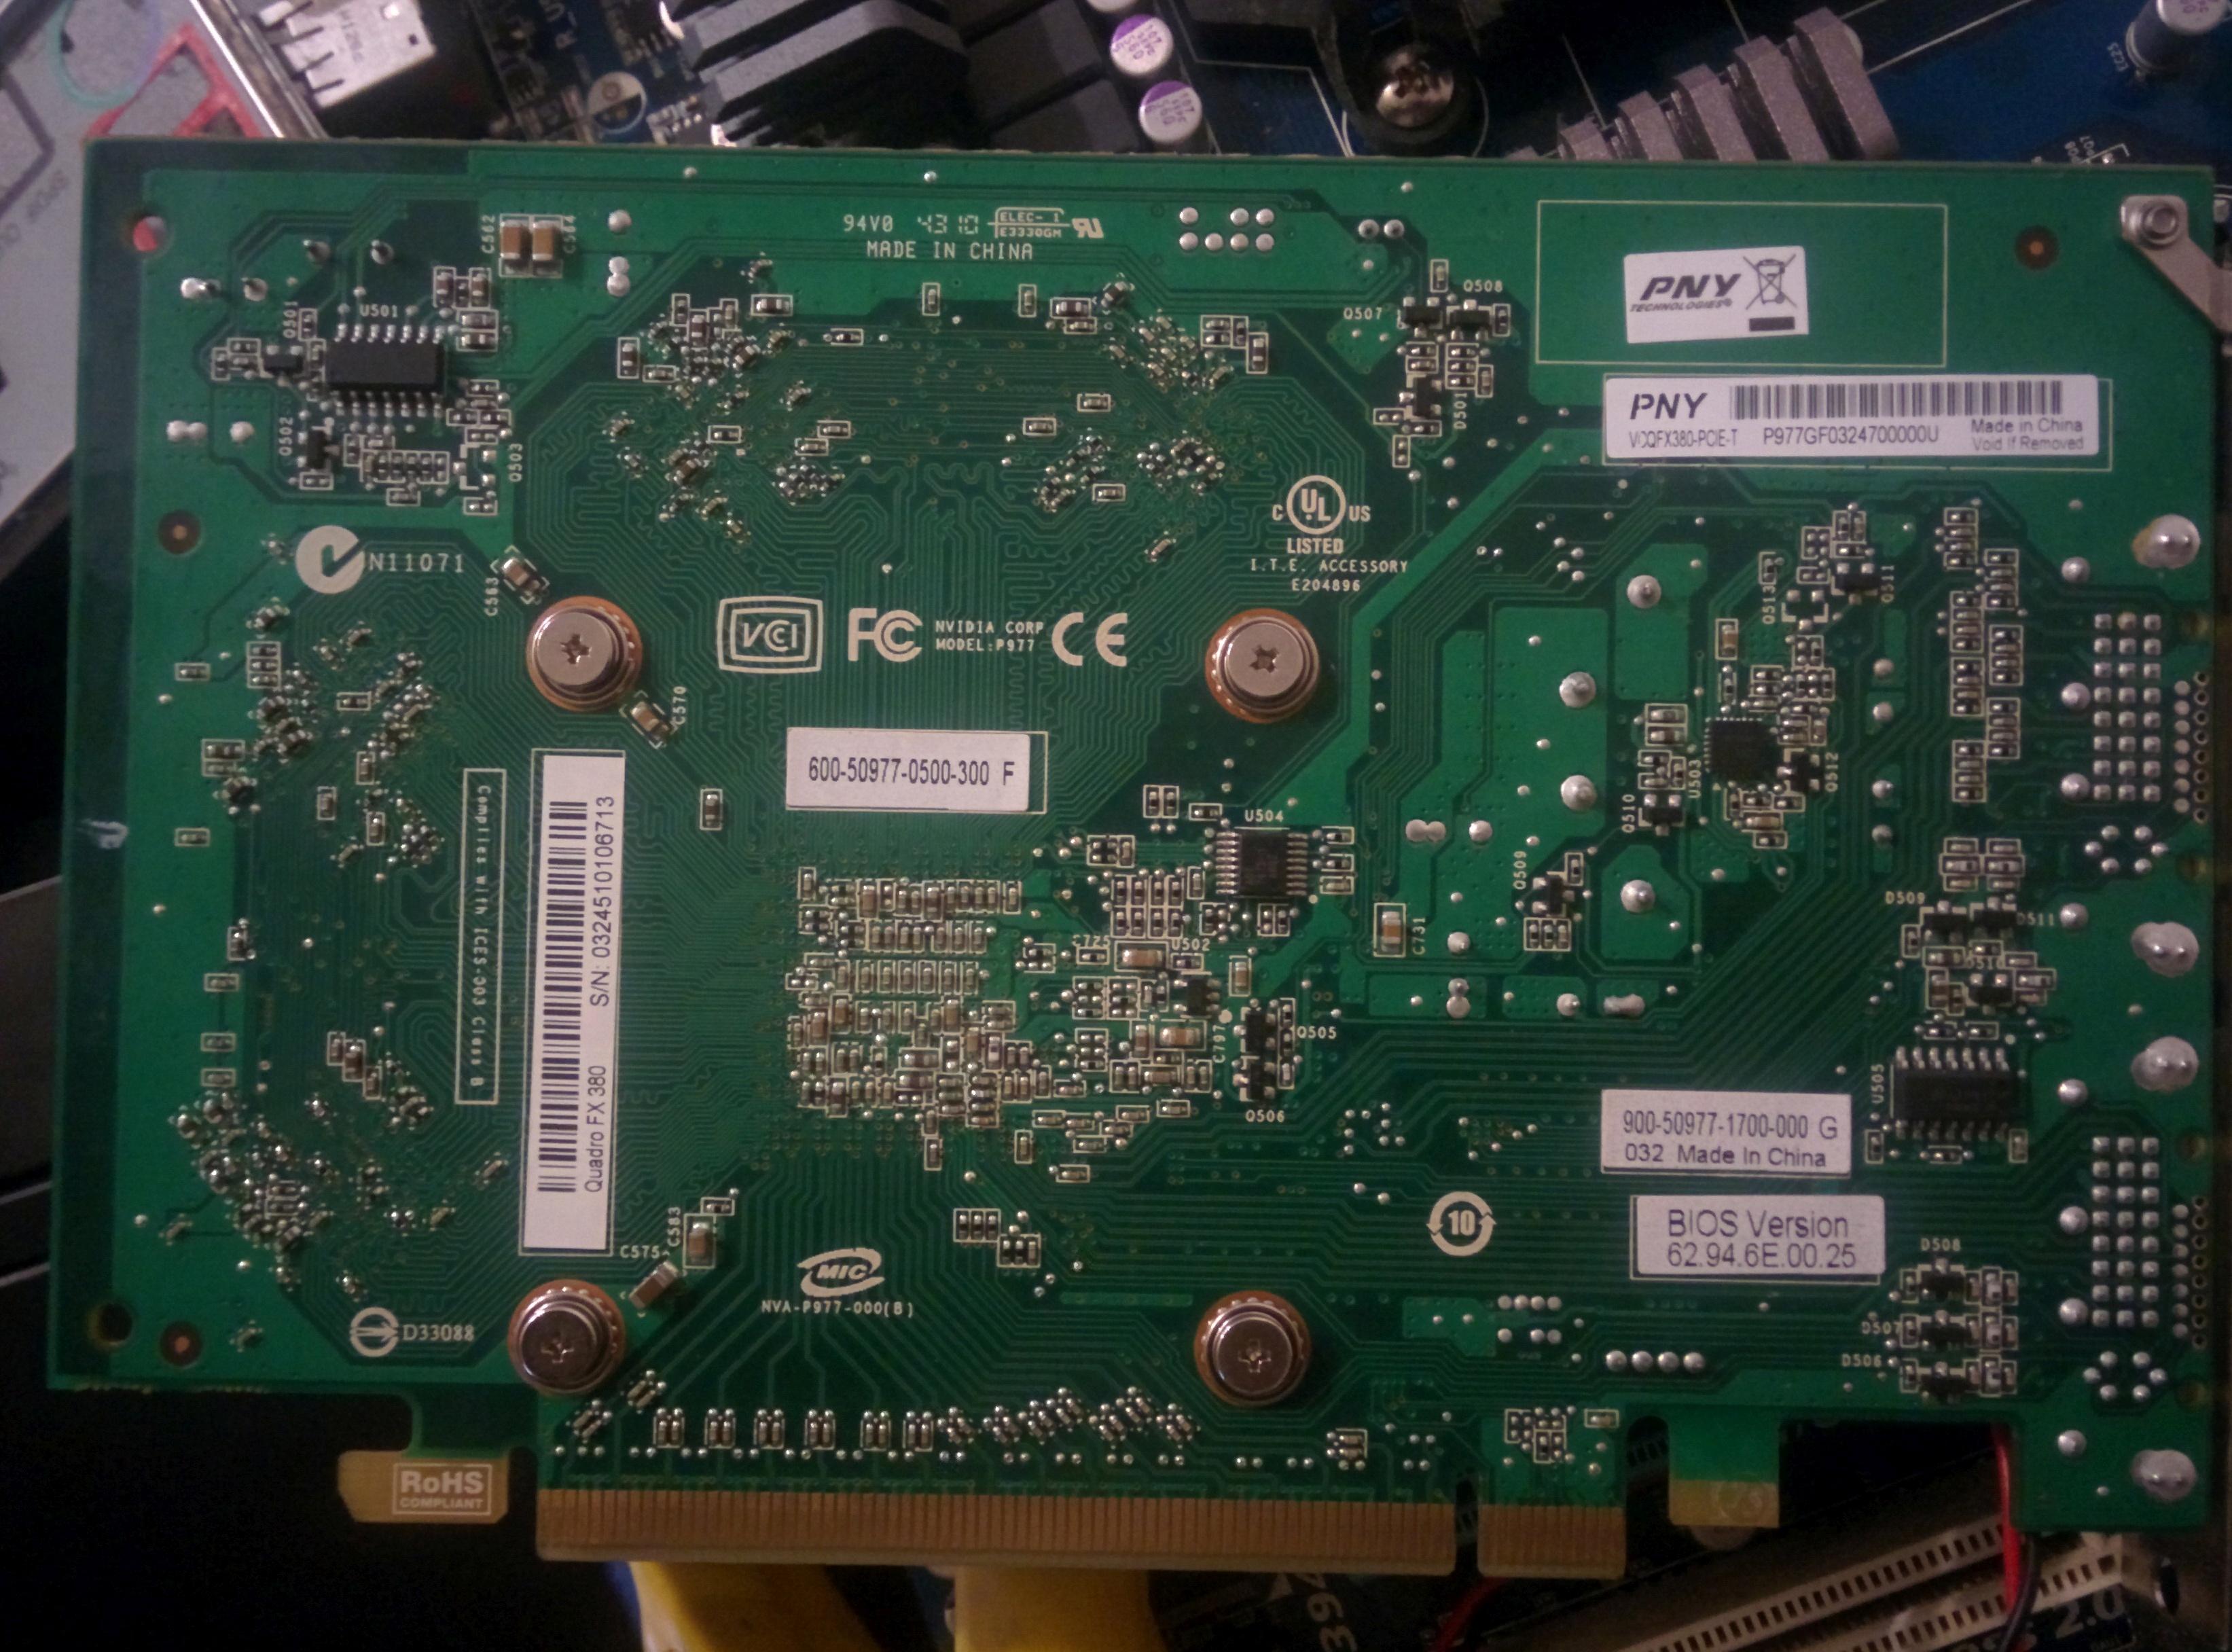 Hattix co uk: Computer Hardware Museum